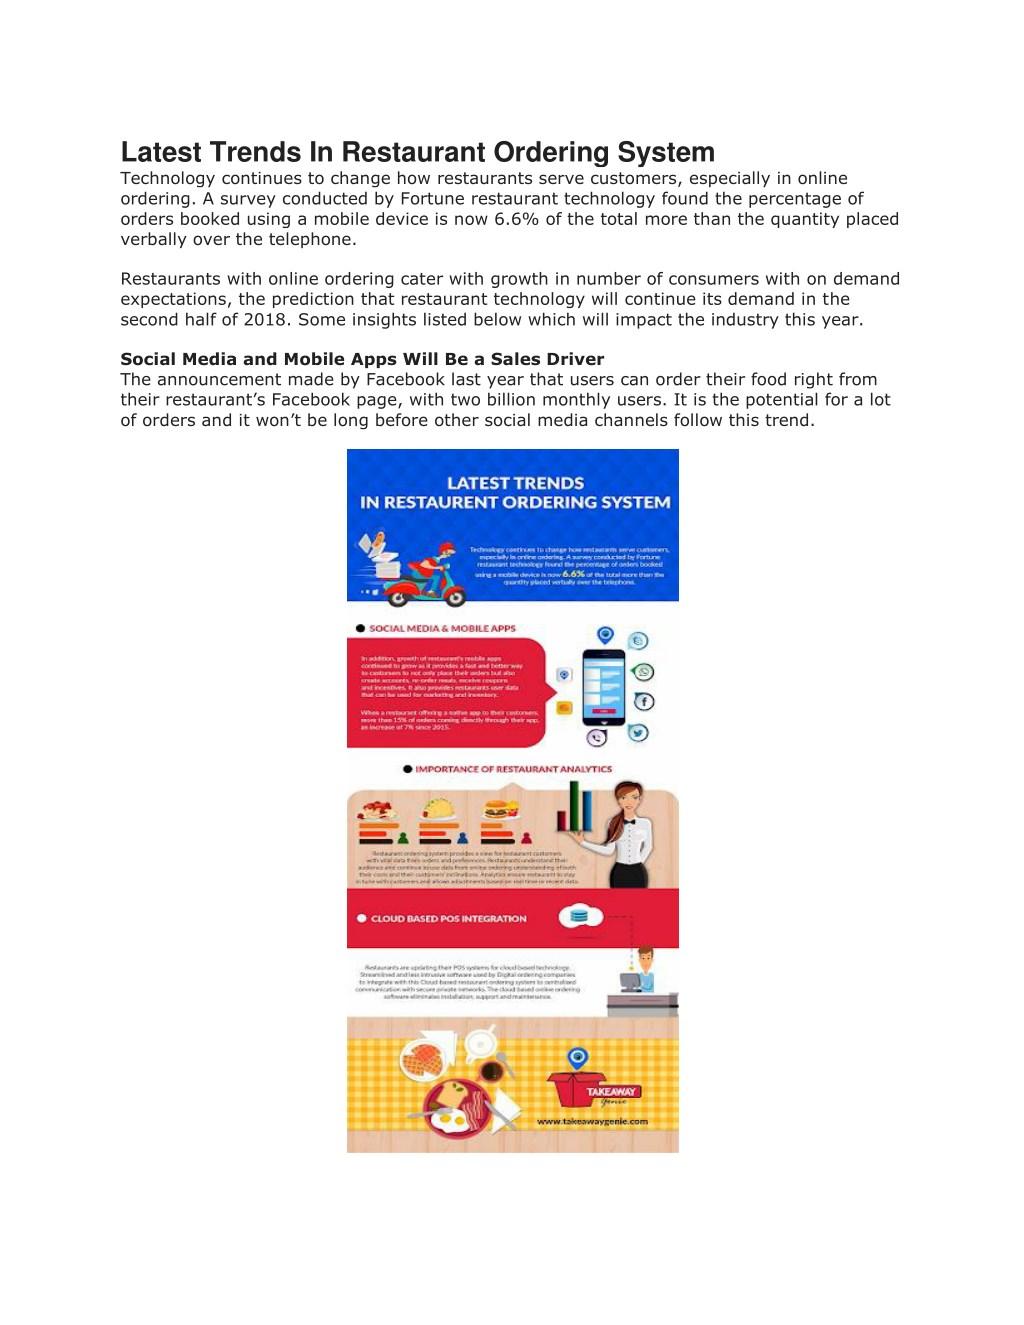 PPT - Best restaurant ordering system for online food ordering